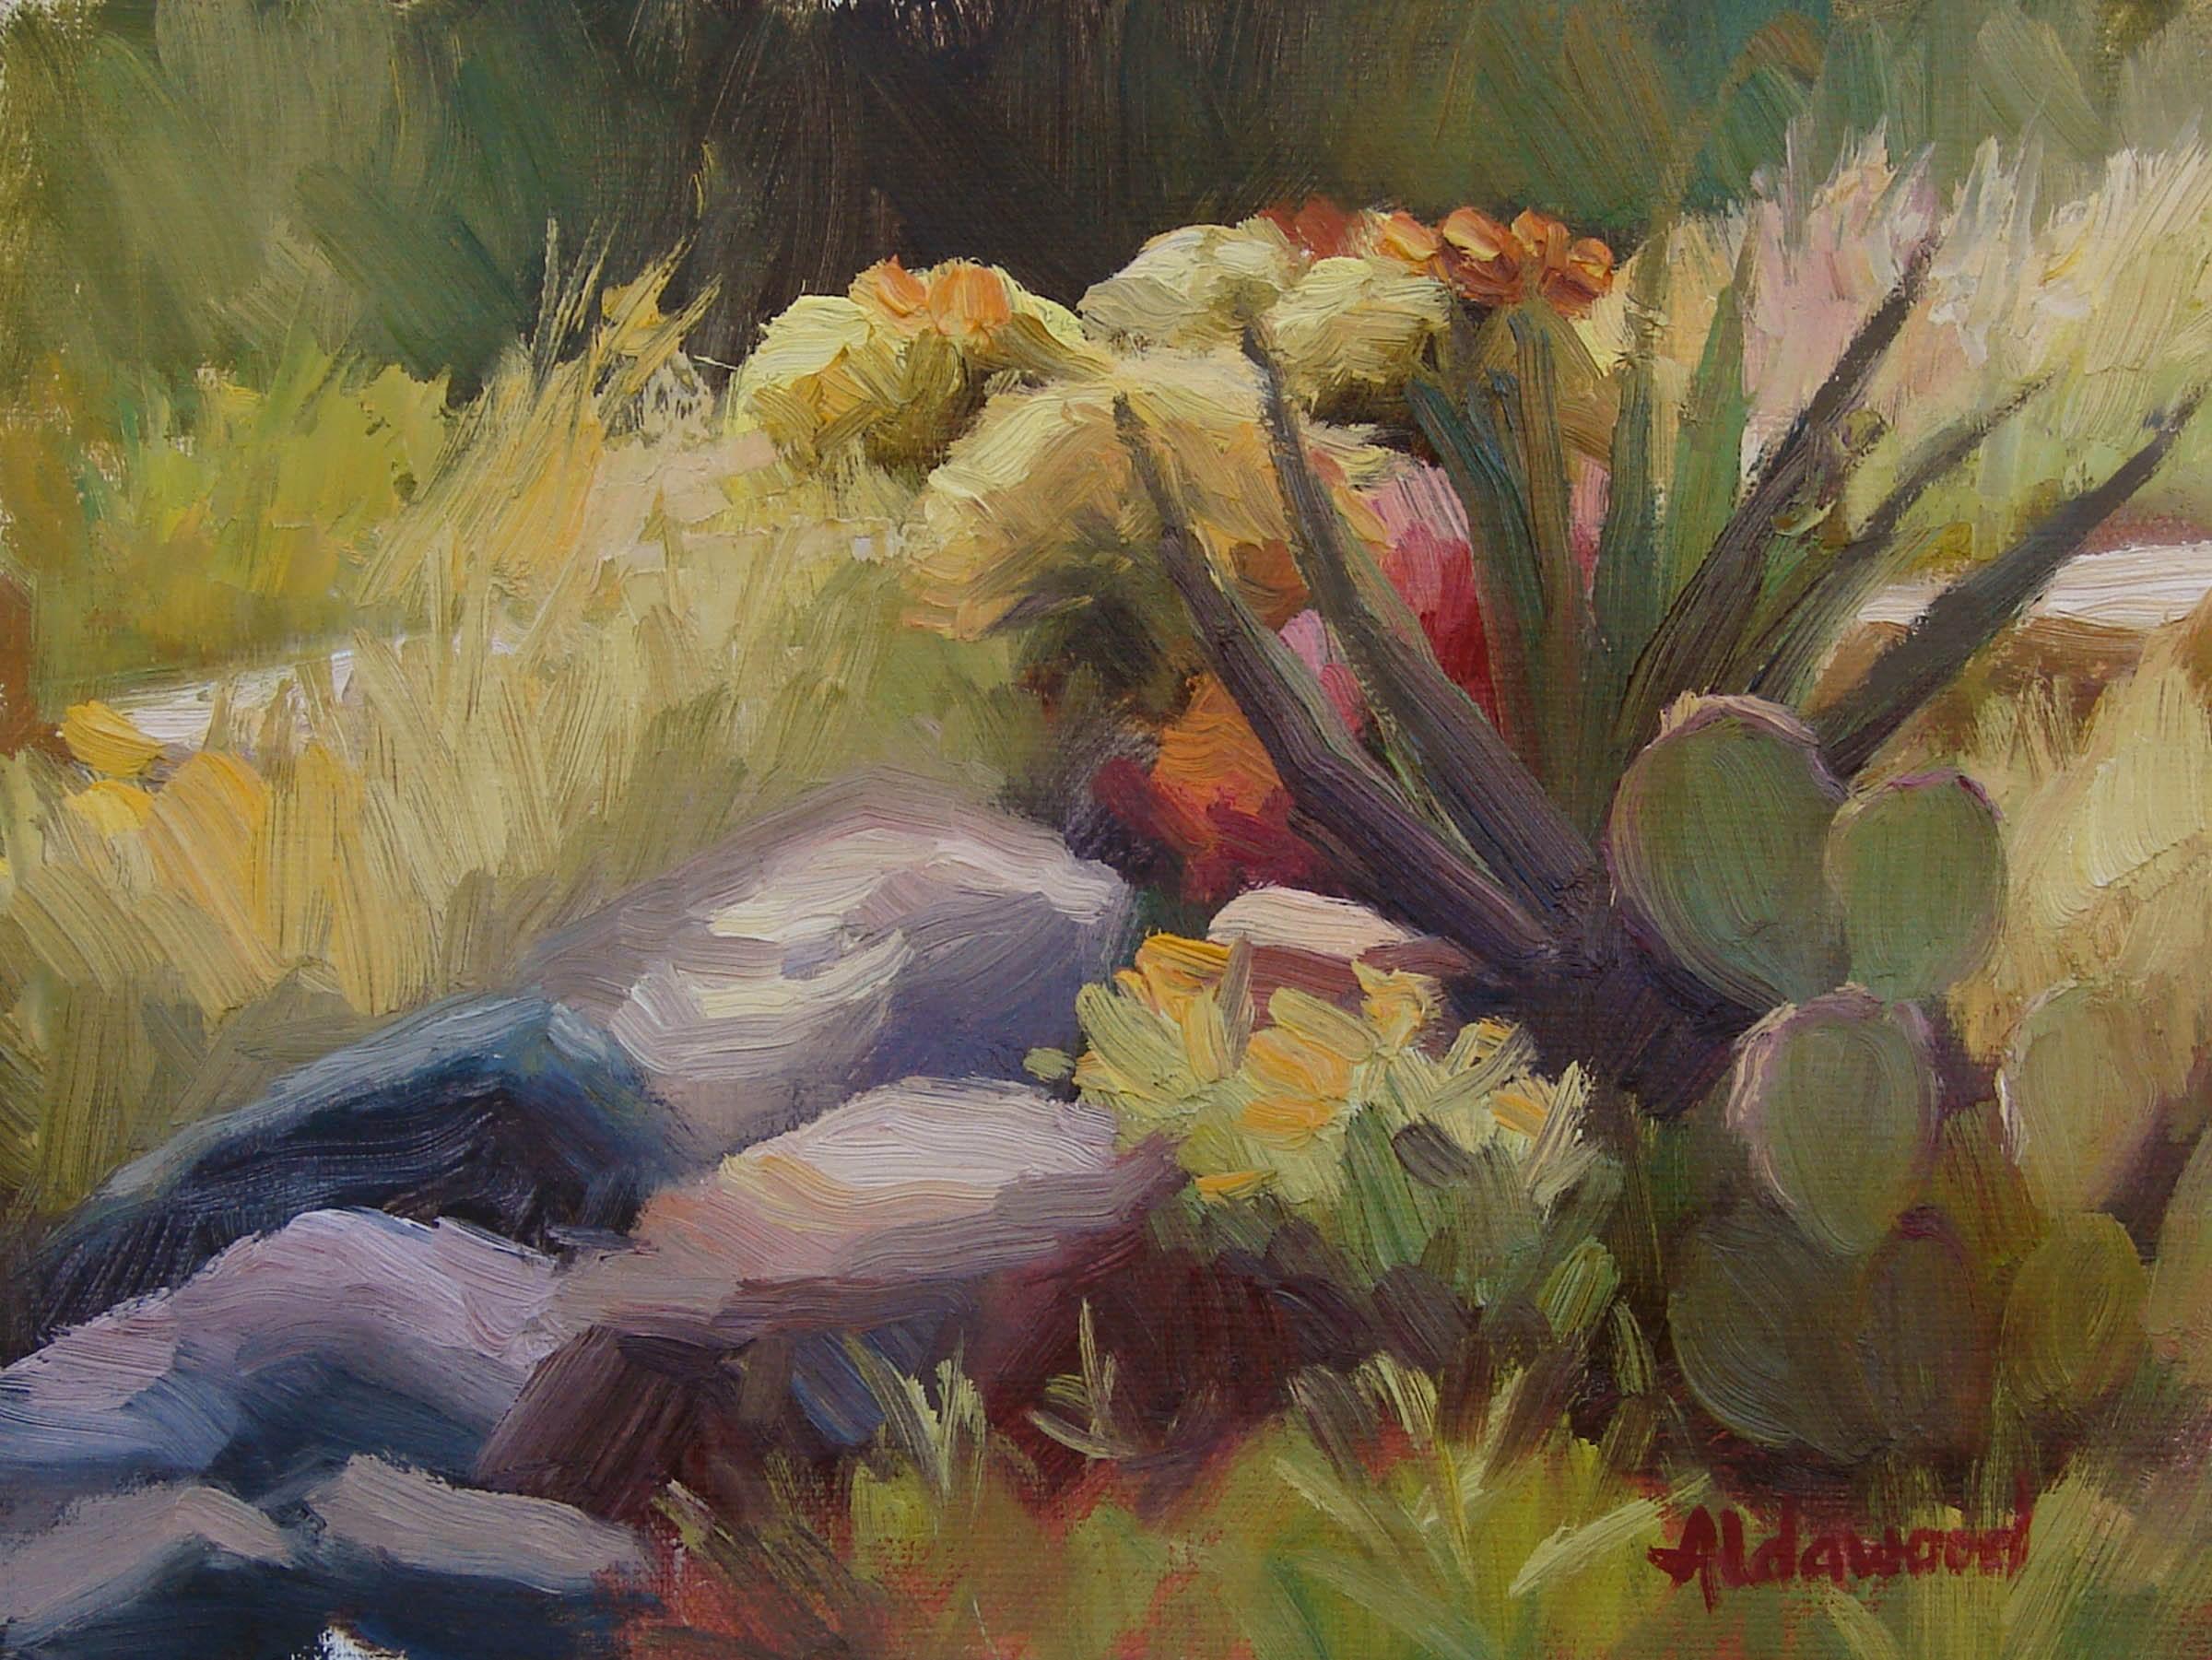 """Study for Barrel Cactus in Mid-day Sun"" original fine art by Sherri Aldawood"